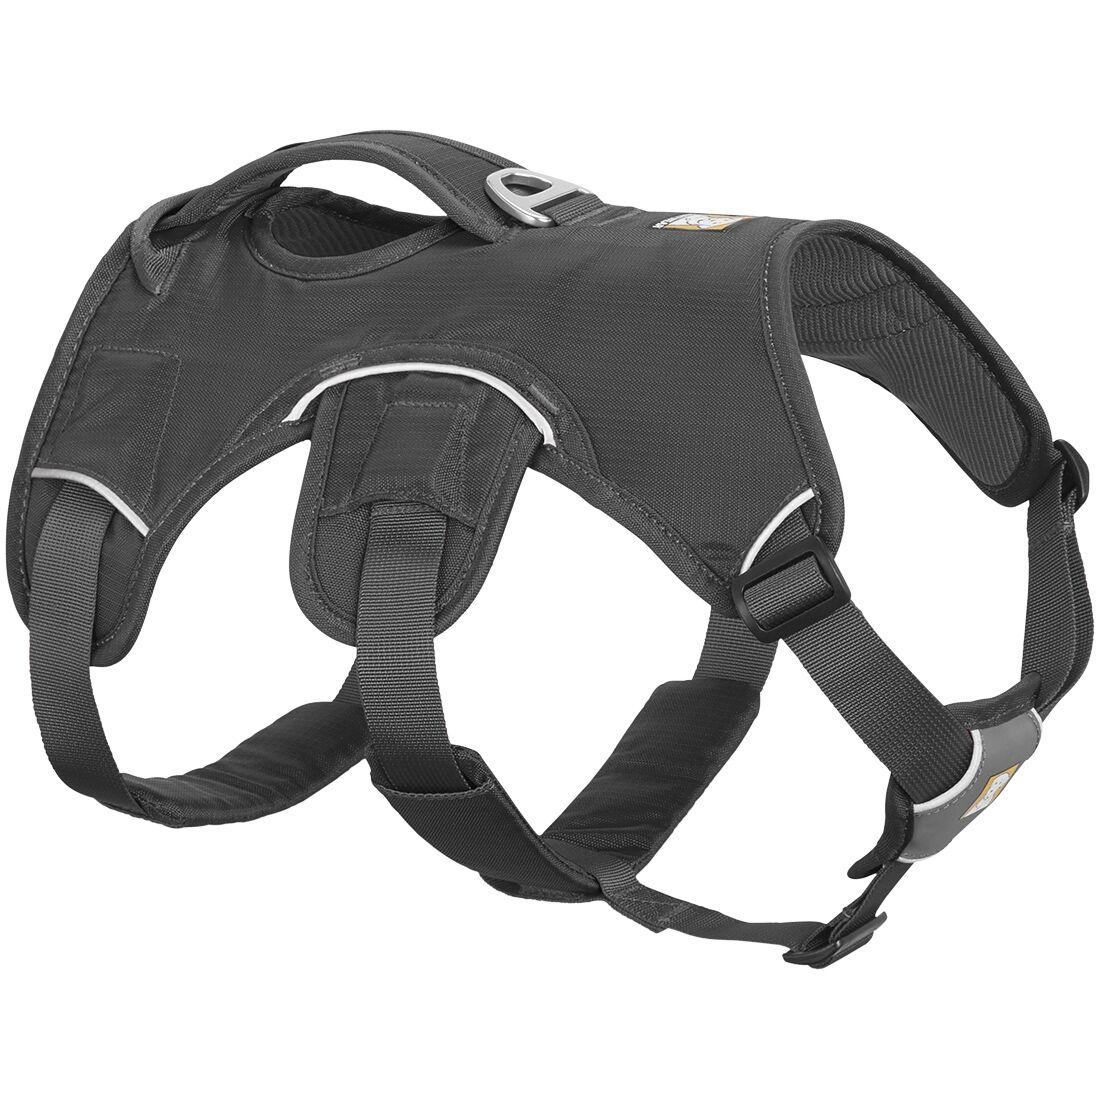 Ruffwear Harnais pour chien Ruffwear Web Master gris Taille : M